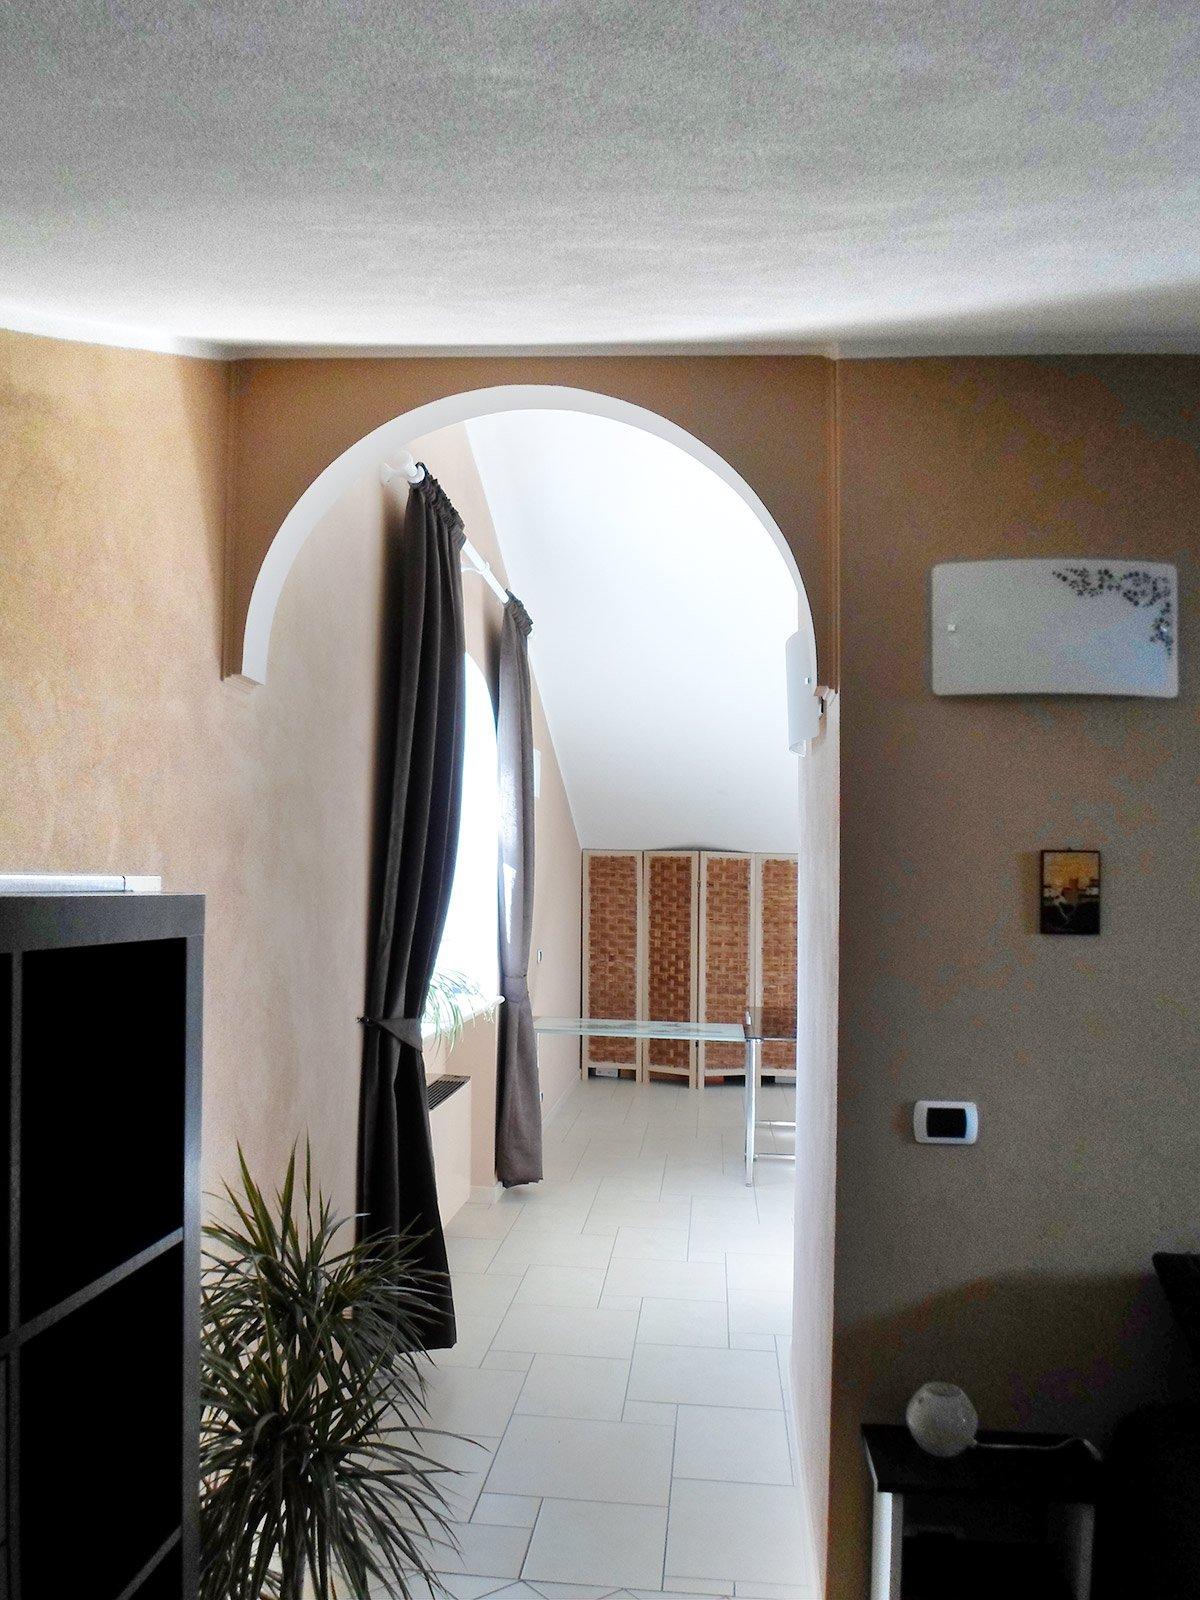 arco dentro casa moderno : 1200 x 1600 jpeg 396kB, Fai da Te Decorare e abbellire Cose di Casa